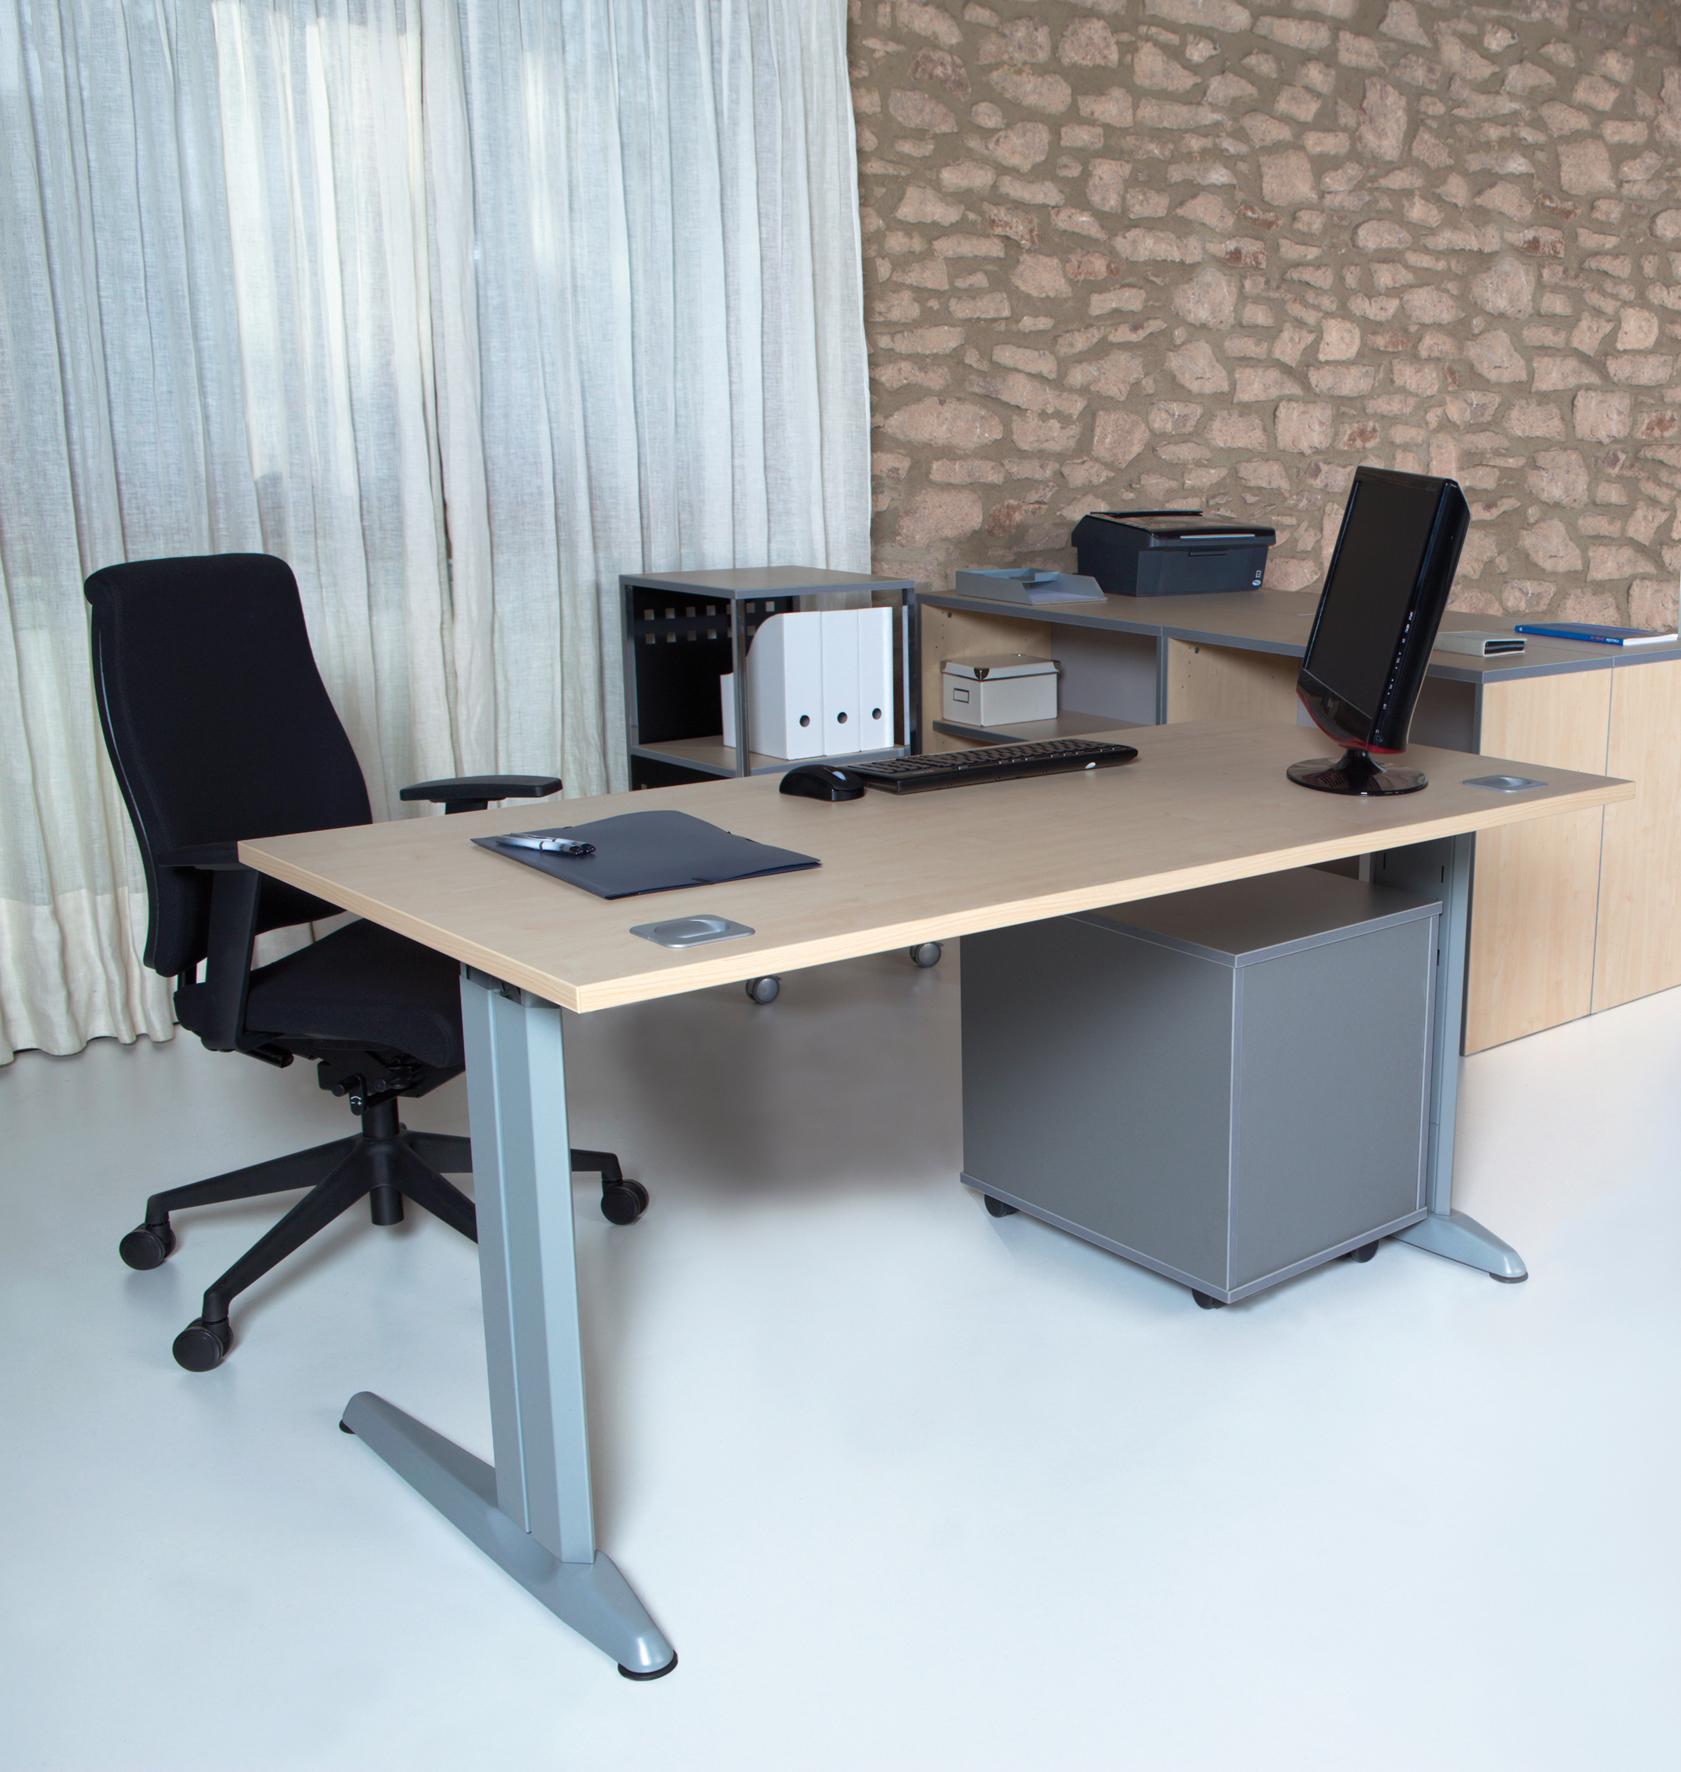 Mesas metal de rocada precios de escritorio para oficina for Precio mesa oficina